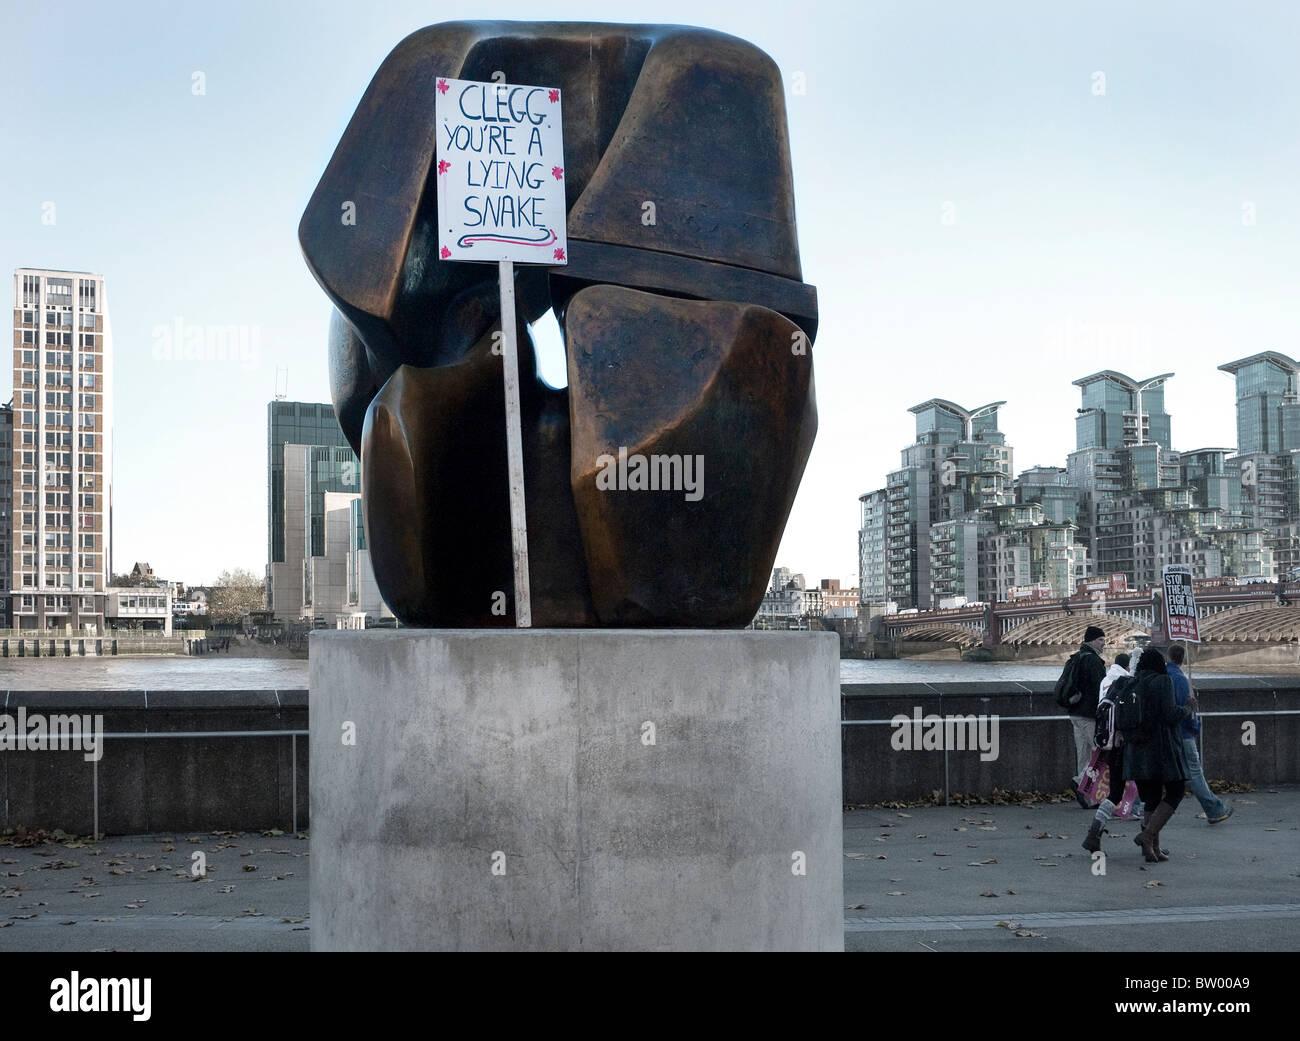 Education fees demo London - Stock Image